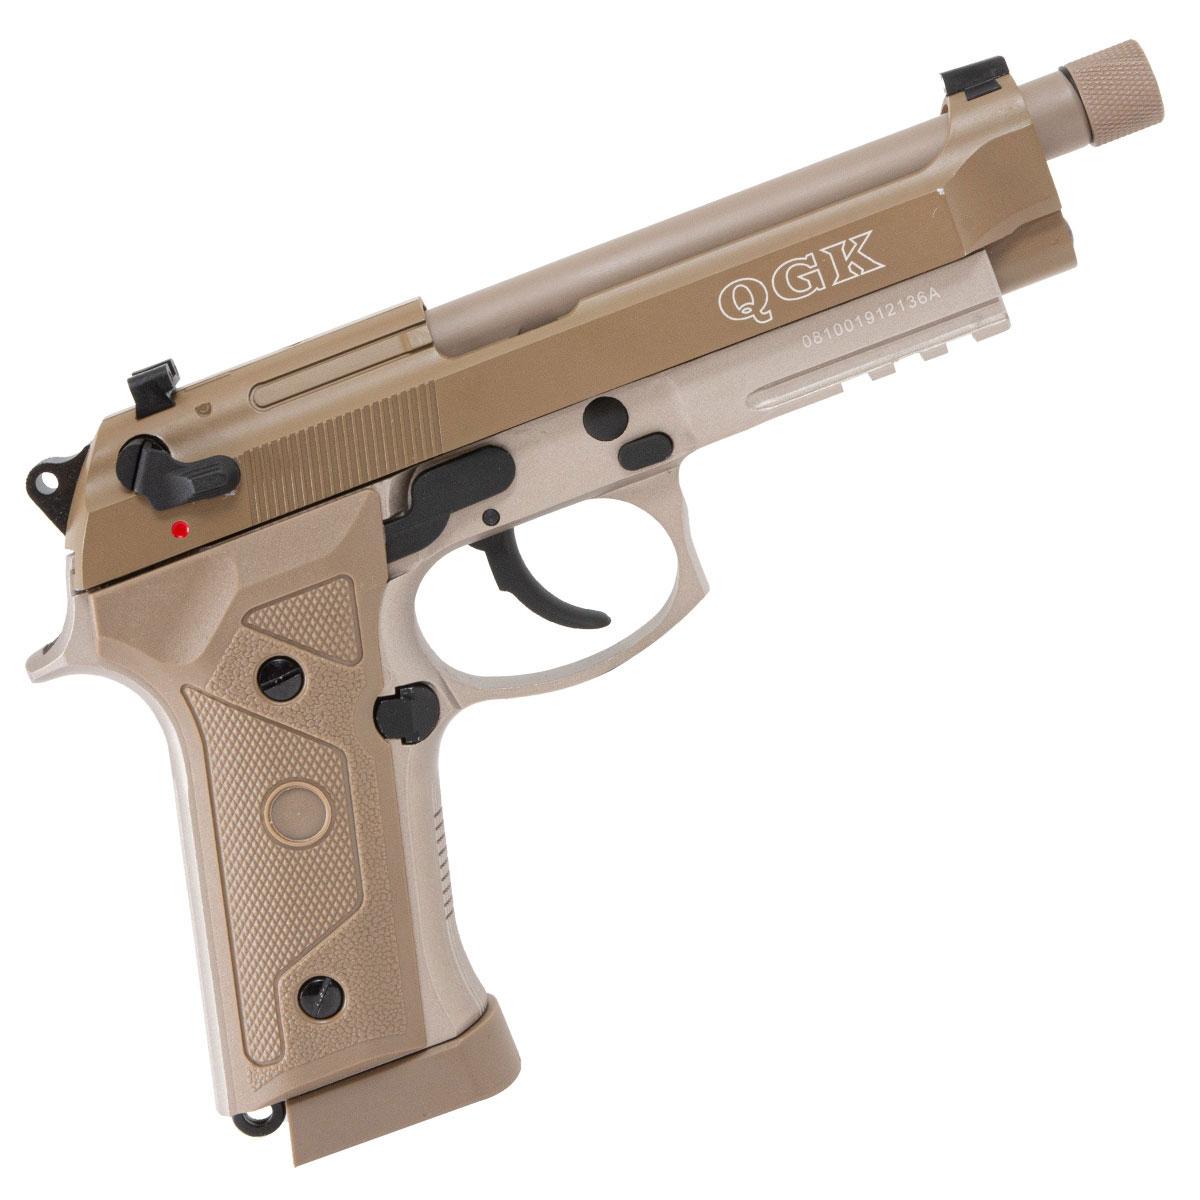 Pistola de Pressão QGK KL93 A3 TN GBB 4.5mm